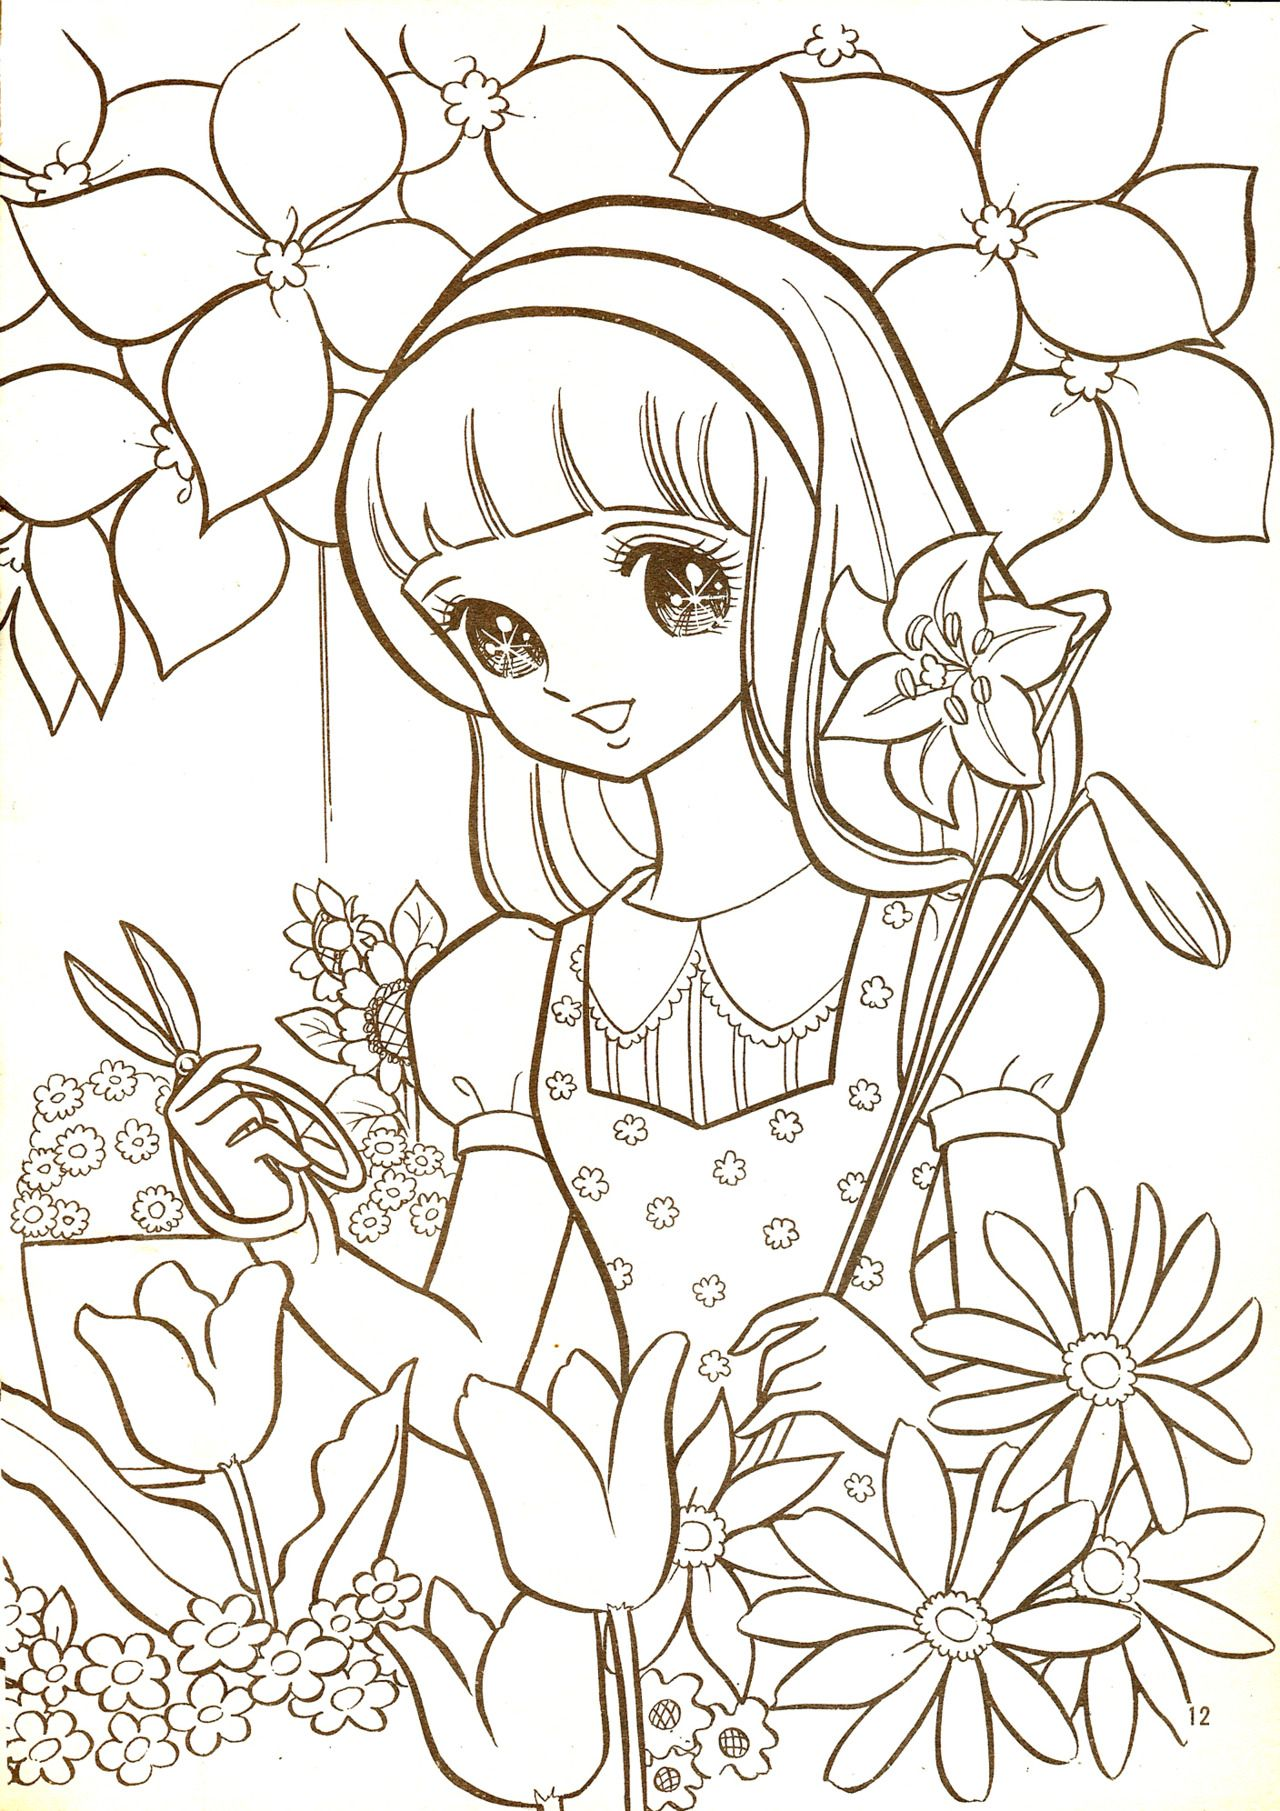 Aeromachia Shojo Manga No Memory Hi 160 This Is Few Coloring Pages From This Vintage Colori Manga Coloring Book Vintage Coloring Books Coloring Books